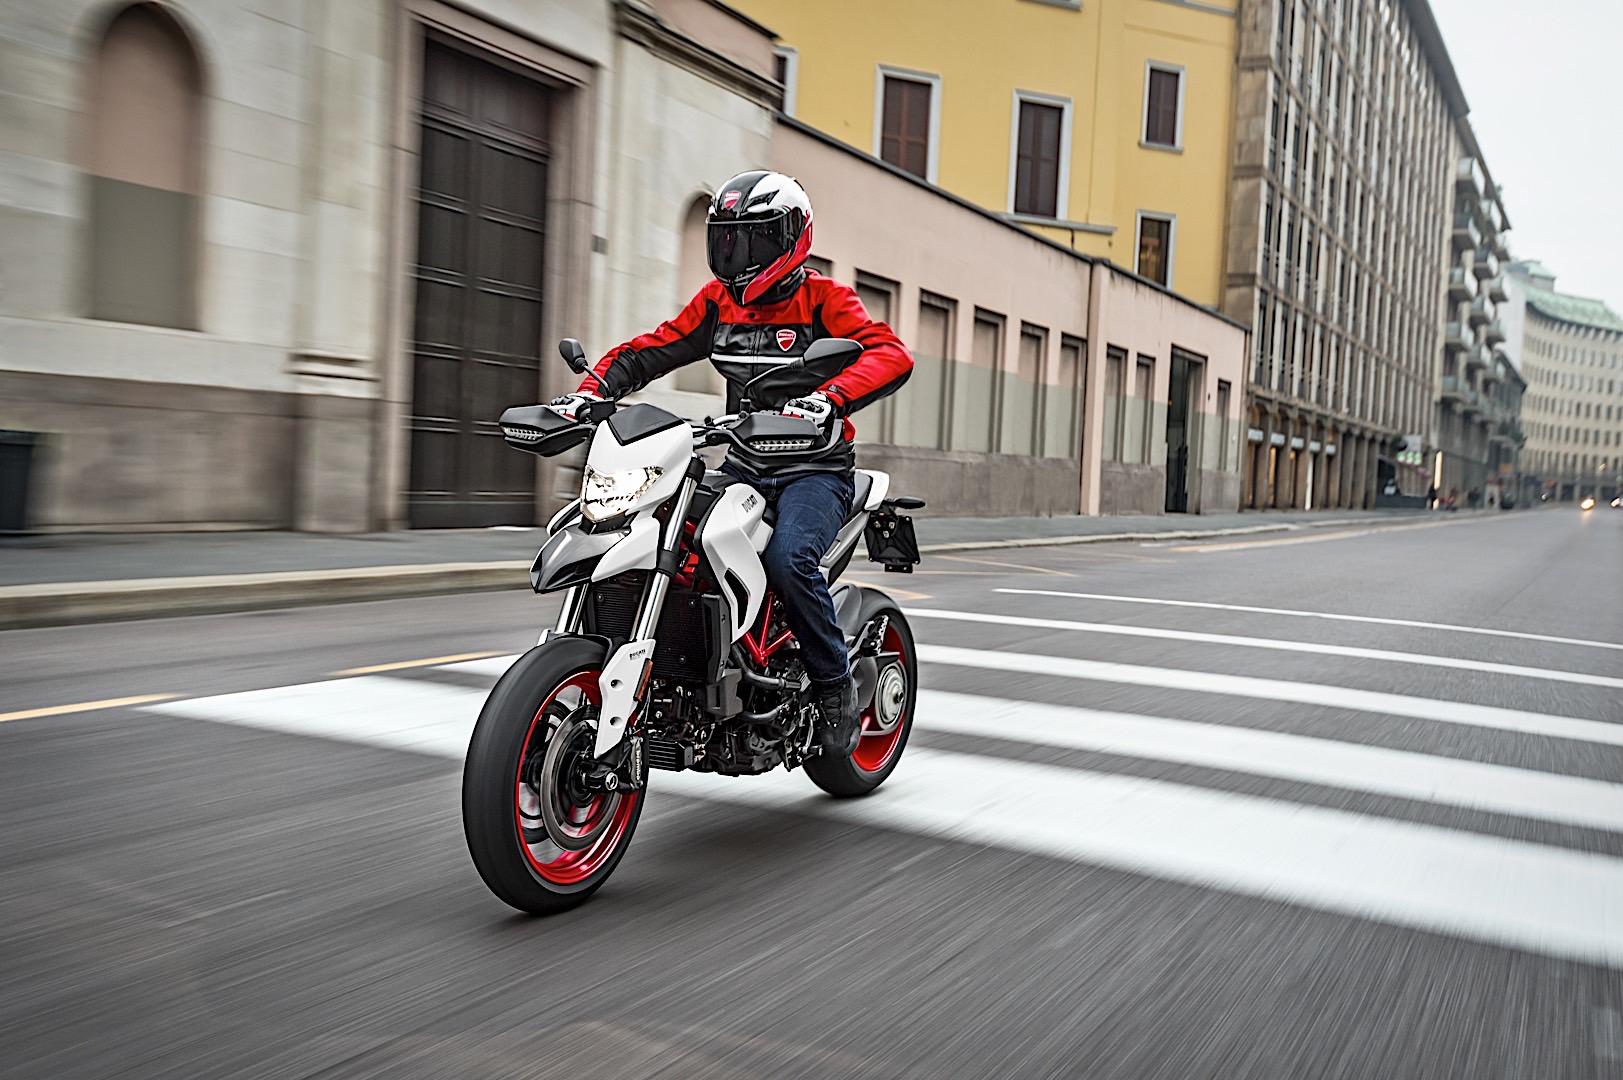 2018 Ducati Hypermotard 939 Gets a Fresh Look - autoevolution